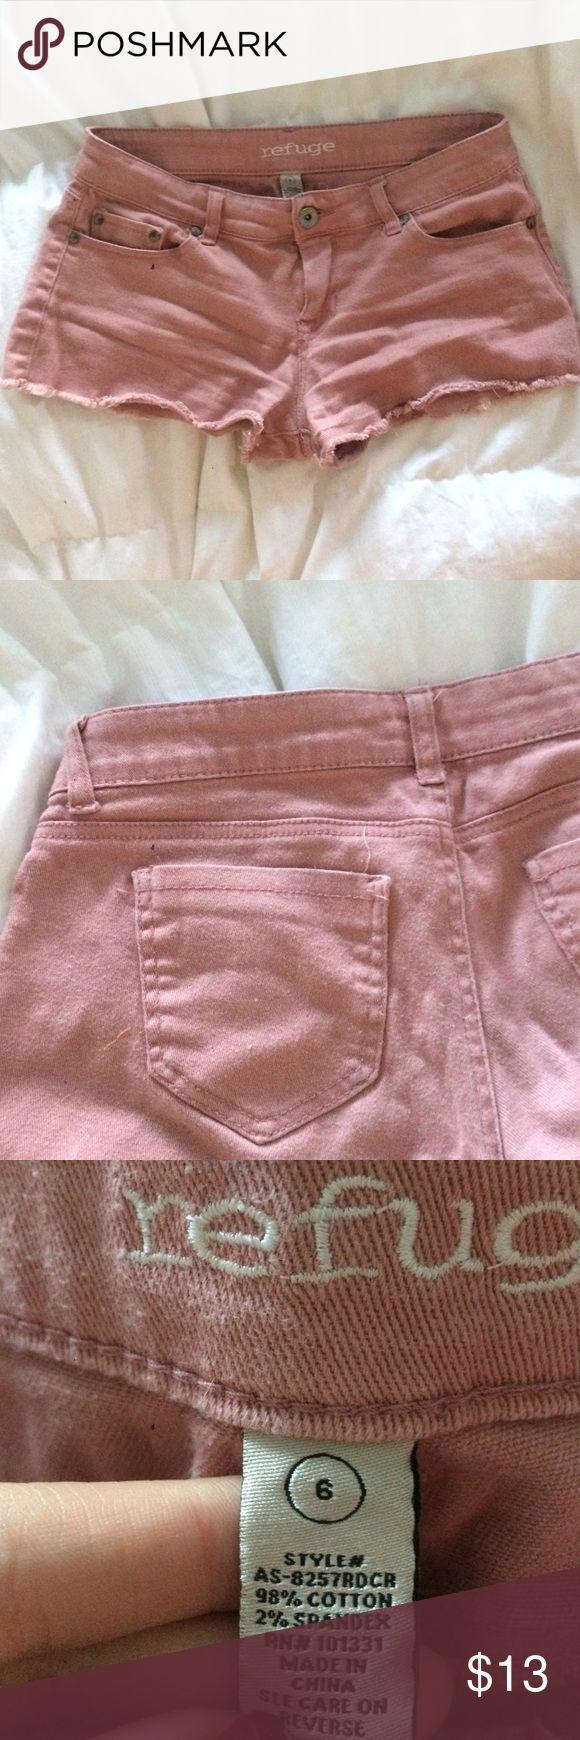 LIGHTWASH MAROON SHORTS classic traditional jean shorts, light pink marron color!! so cute refuge Shorts Jean Shorts